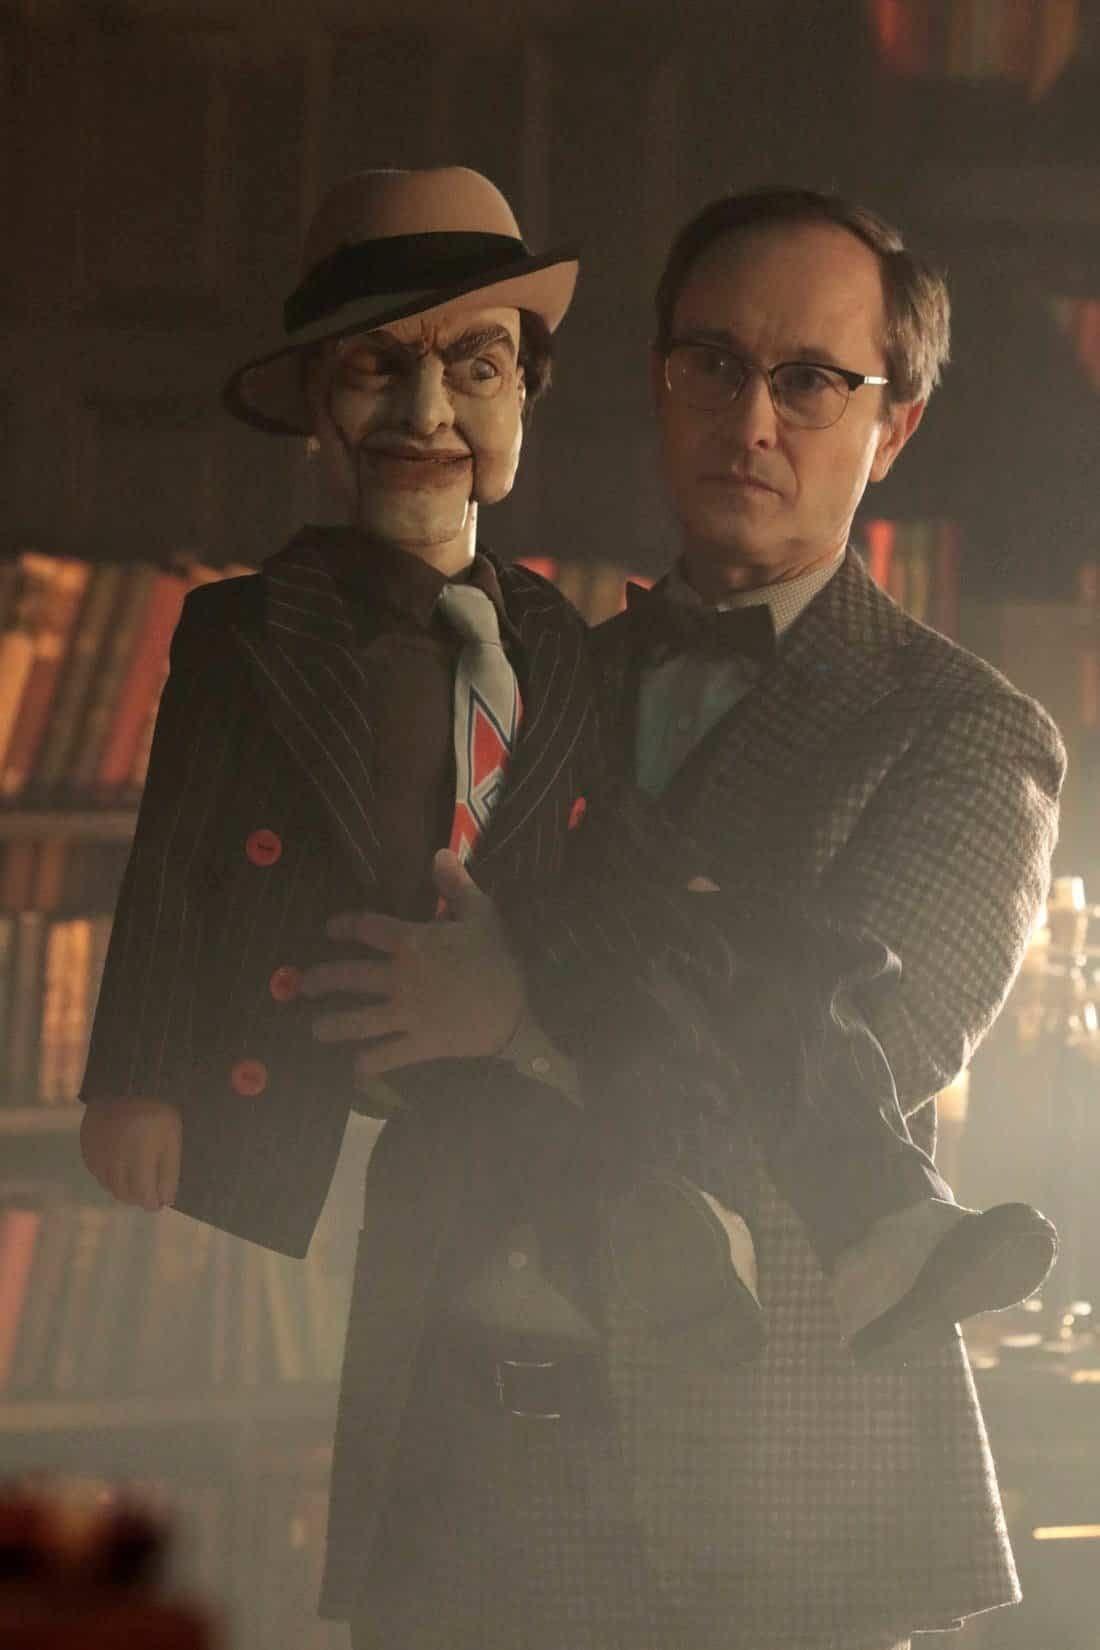 'Gotham' Season 5 Teases Appearance of Greatest Bat Villain Ever! [PREVIEW]